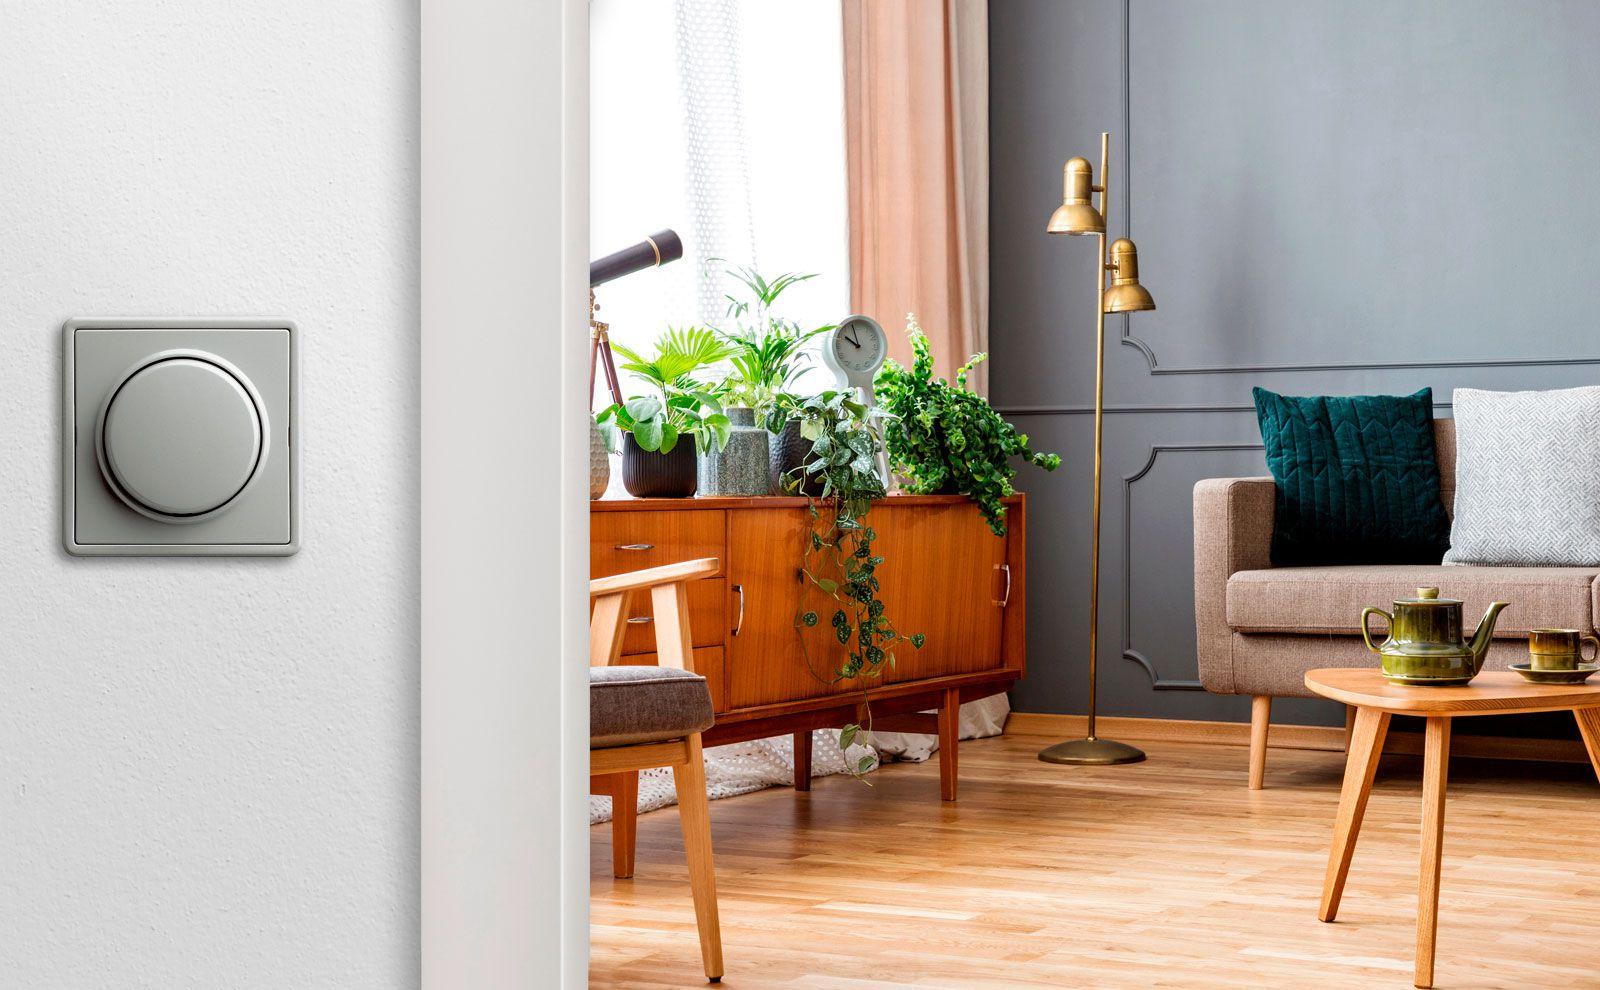 Gira S-Color, Farbe grau auf weißer Wand